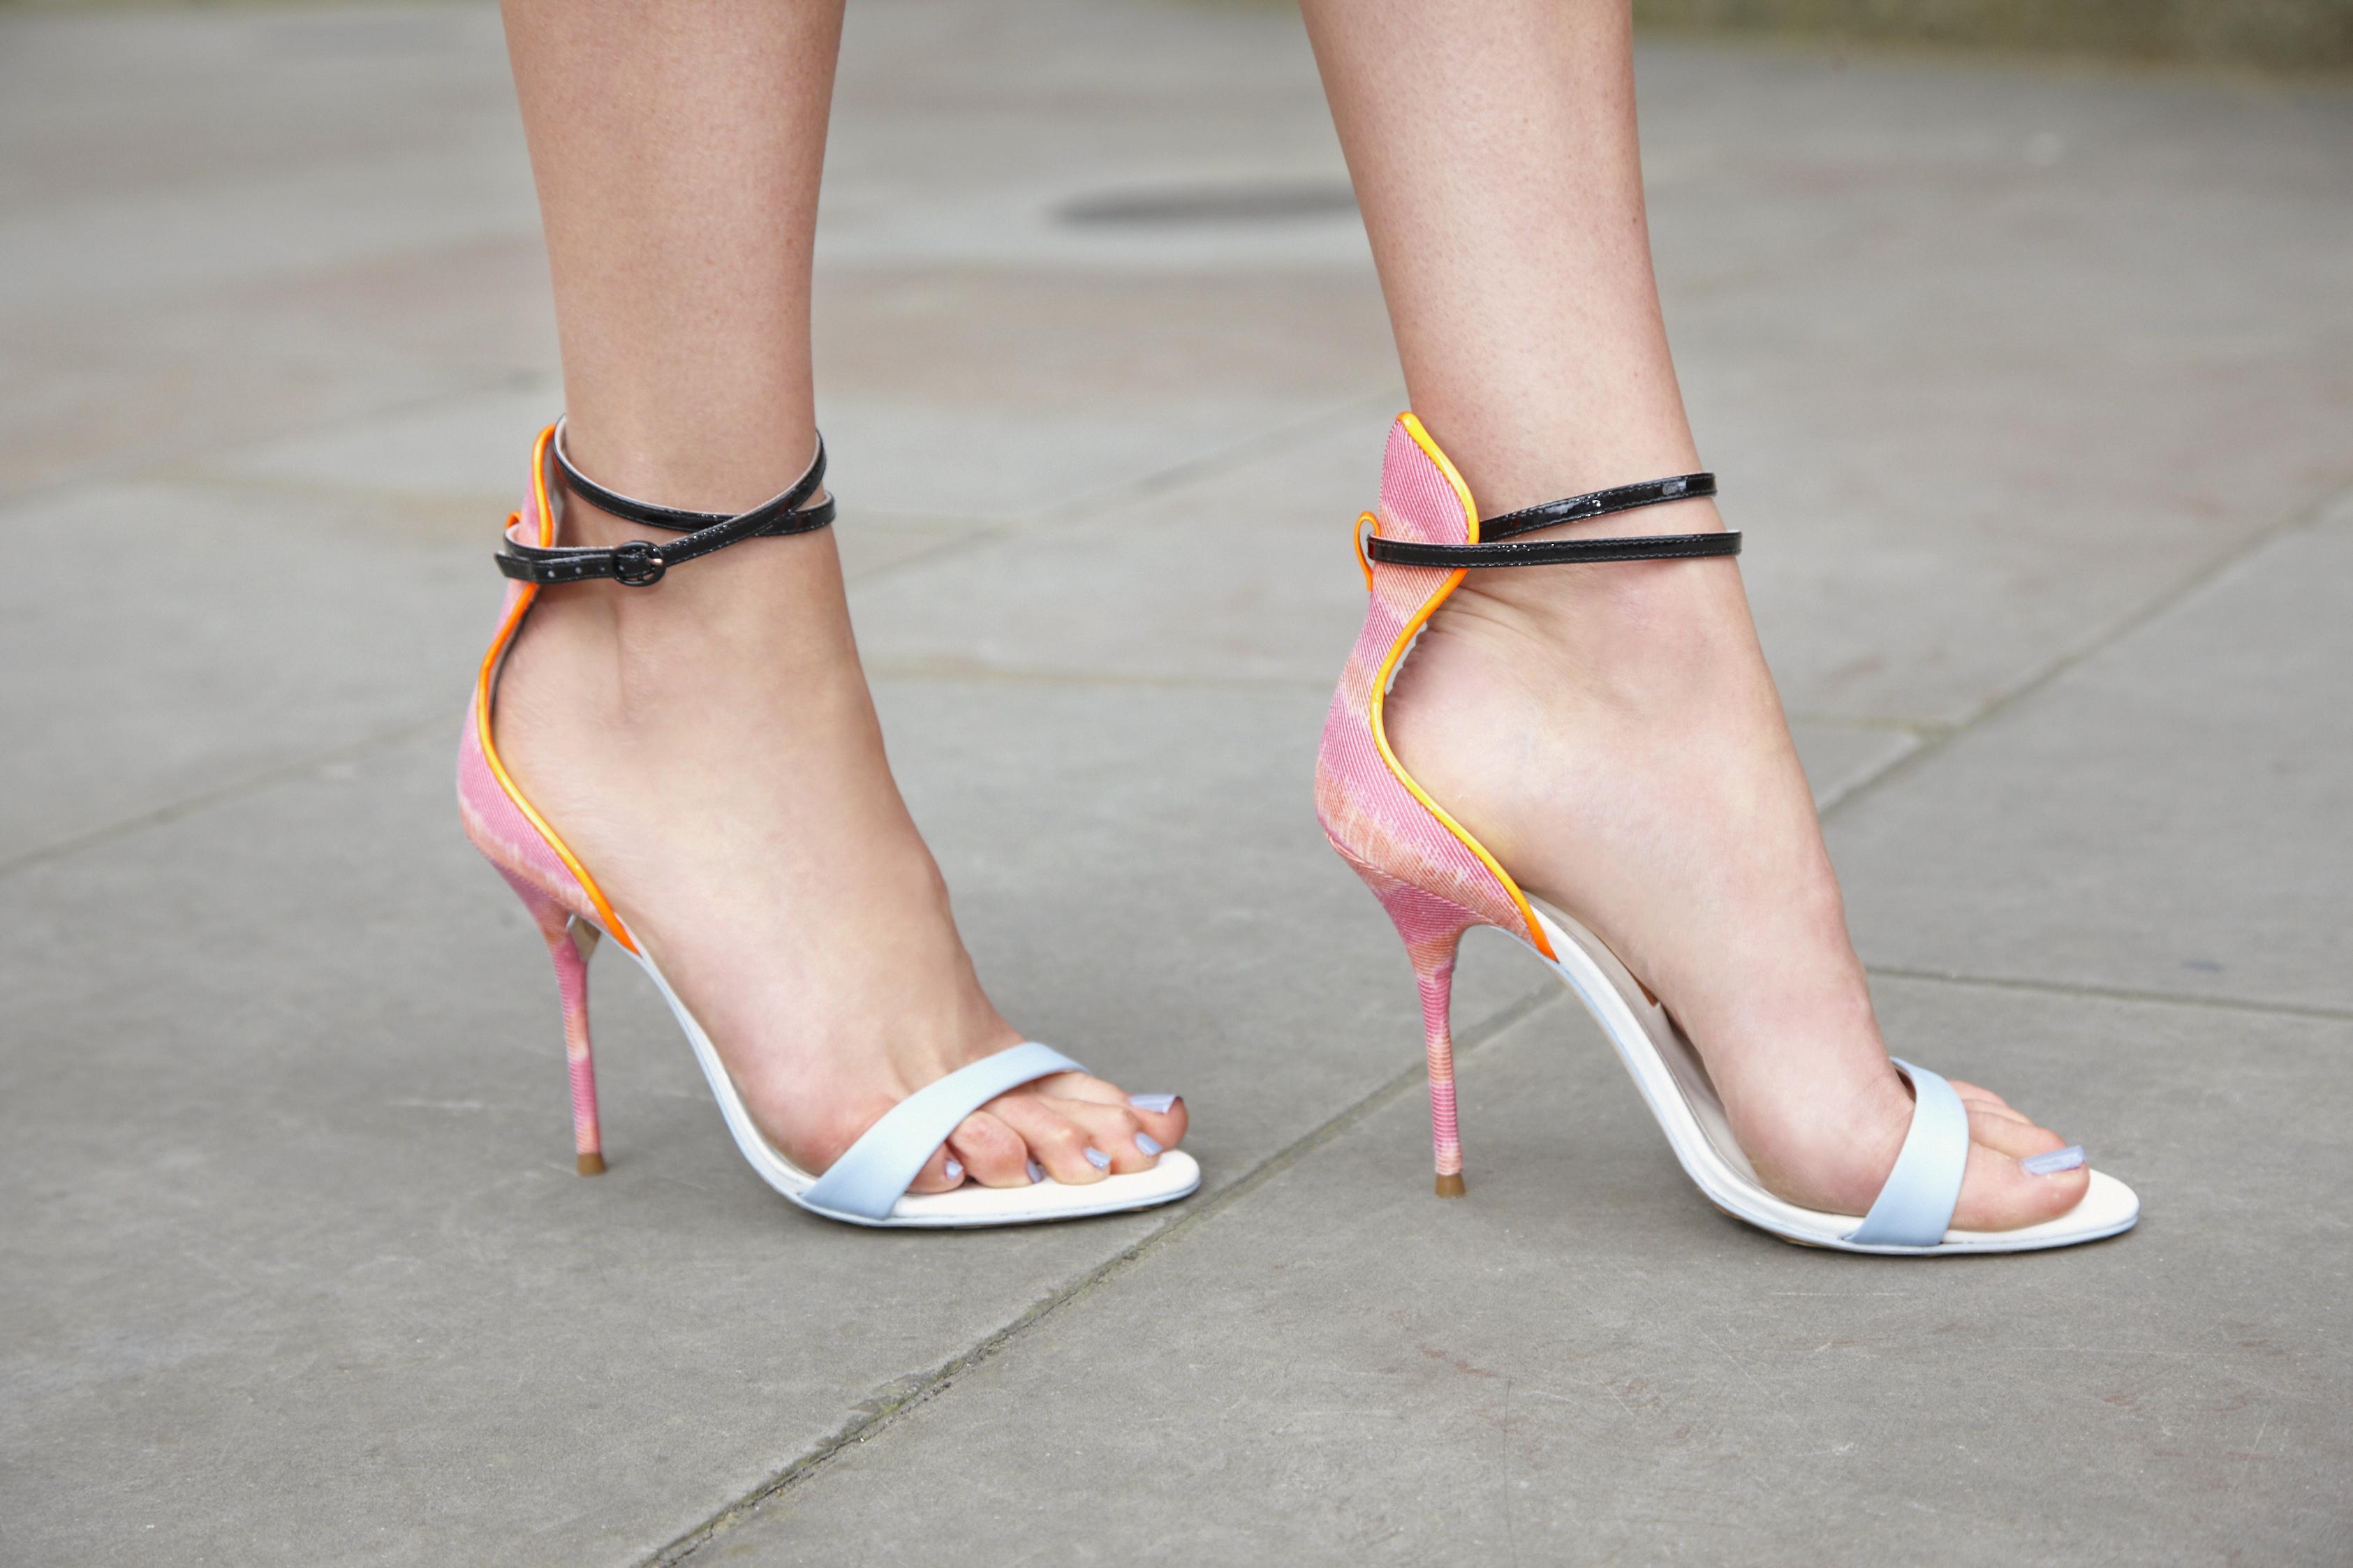 Feet Emma Miller nudes (83 pics), Twitter